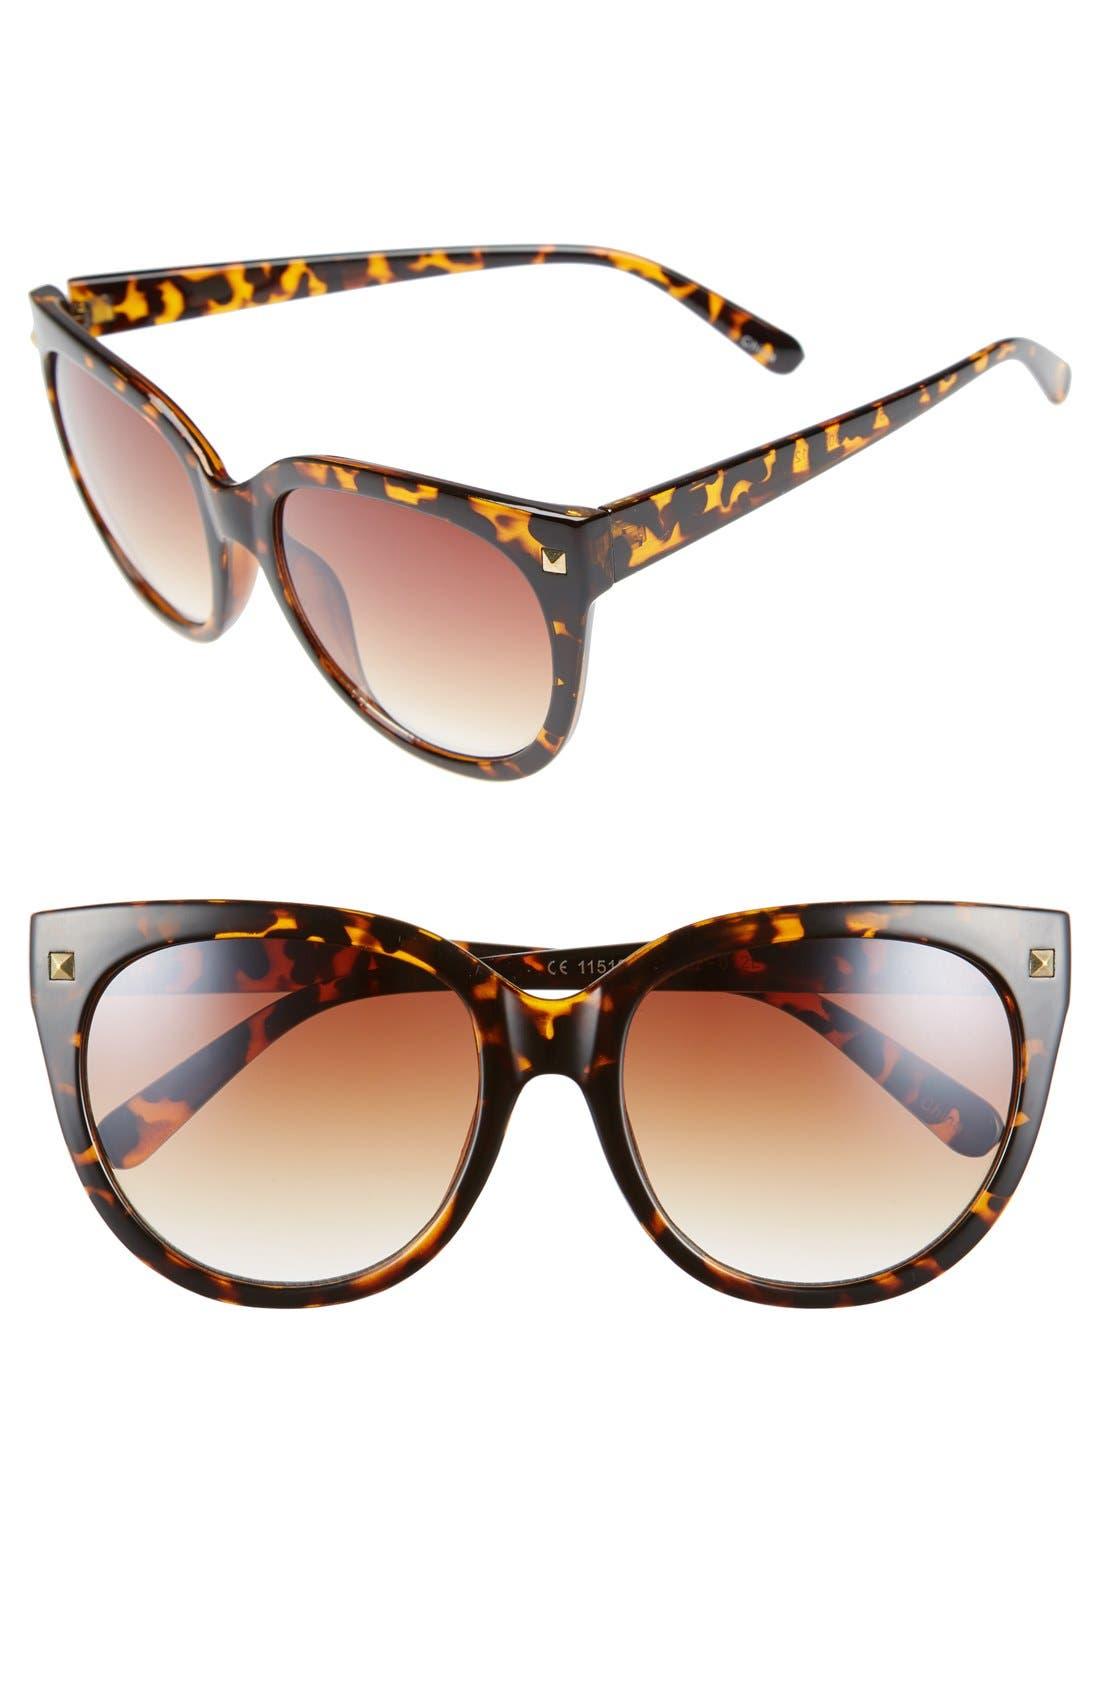 Main Image - BP. 55mm Oversize Cat Eye Sunglasses